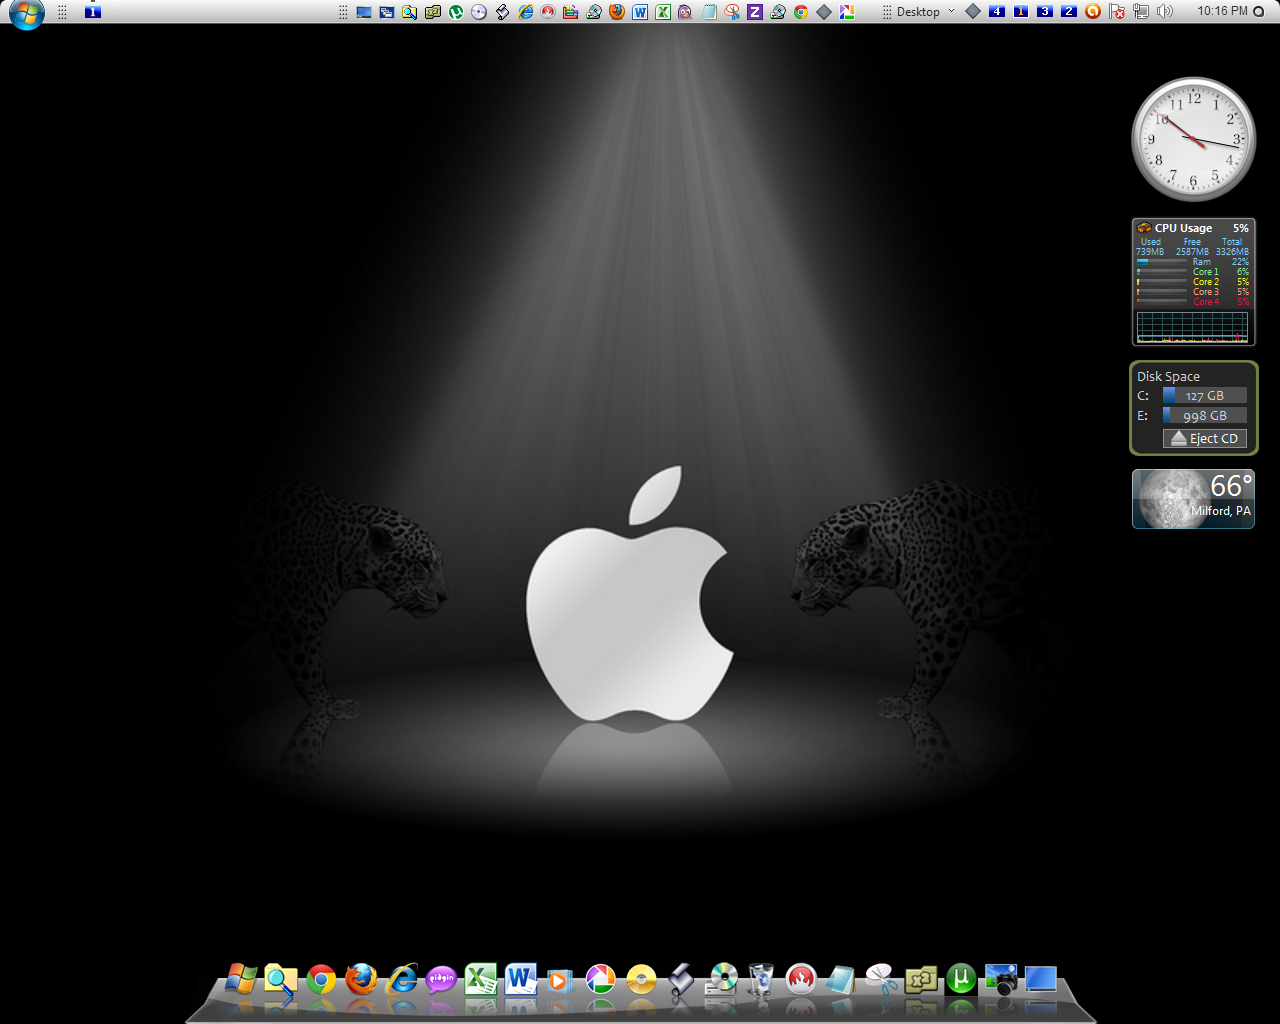 Everything Windows: August Desktop - Tribute to Apple